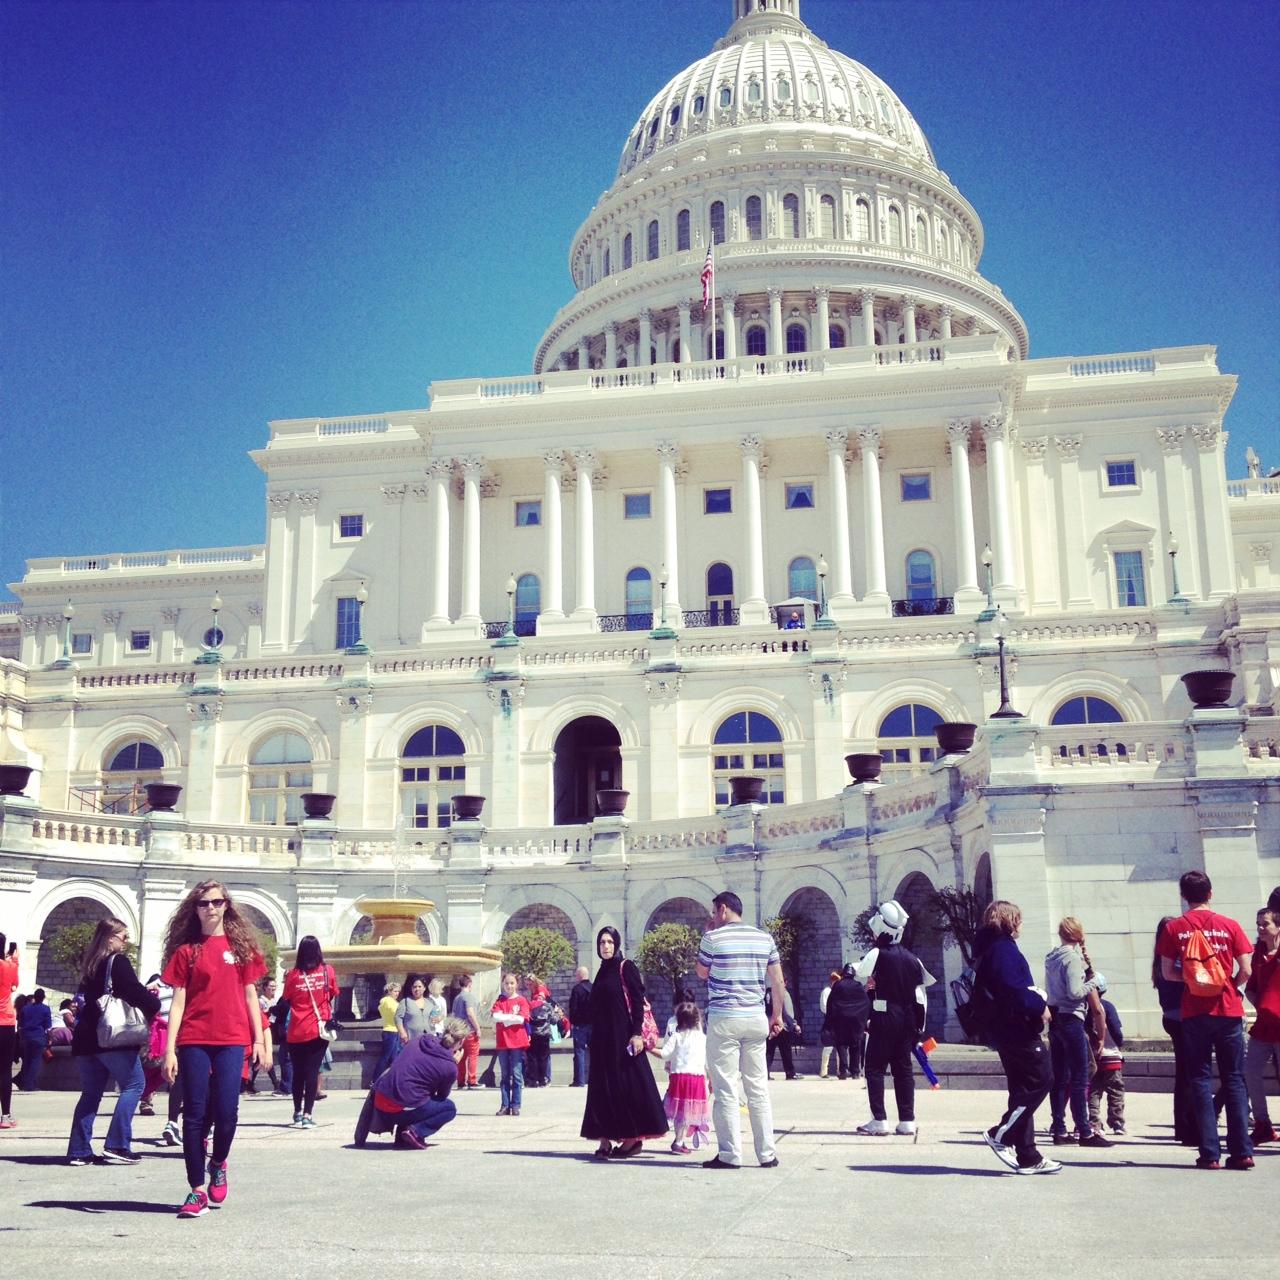 US Capitol, April '14, Photo: Kate Gallery, Neighborhood Nomads